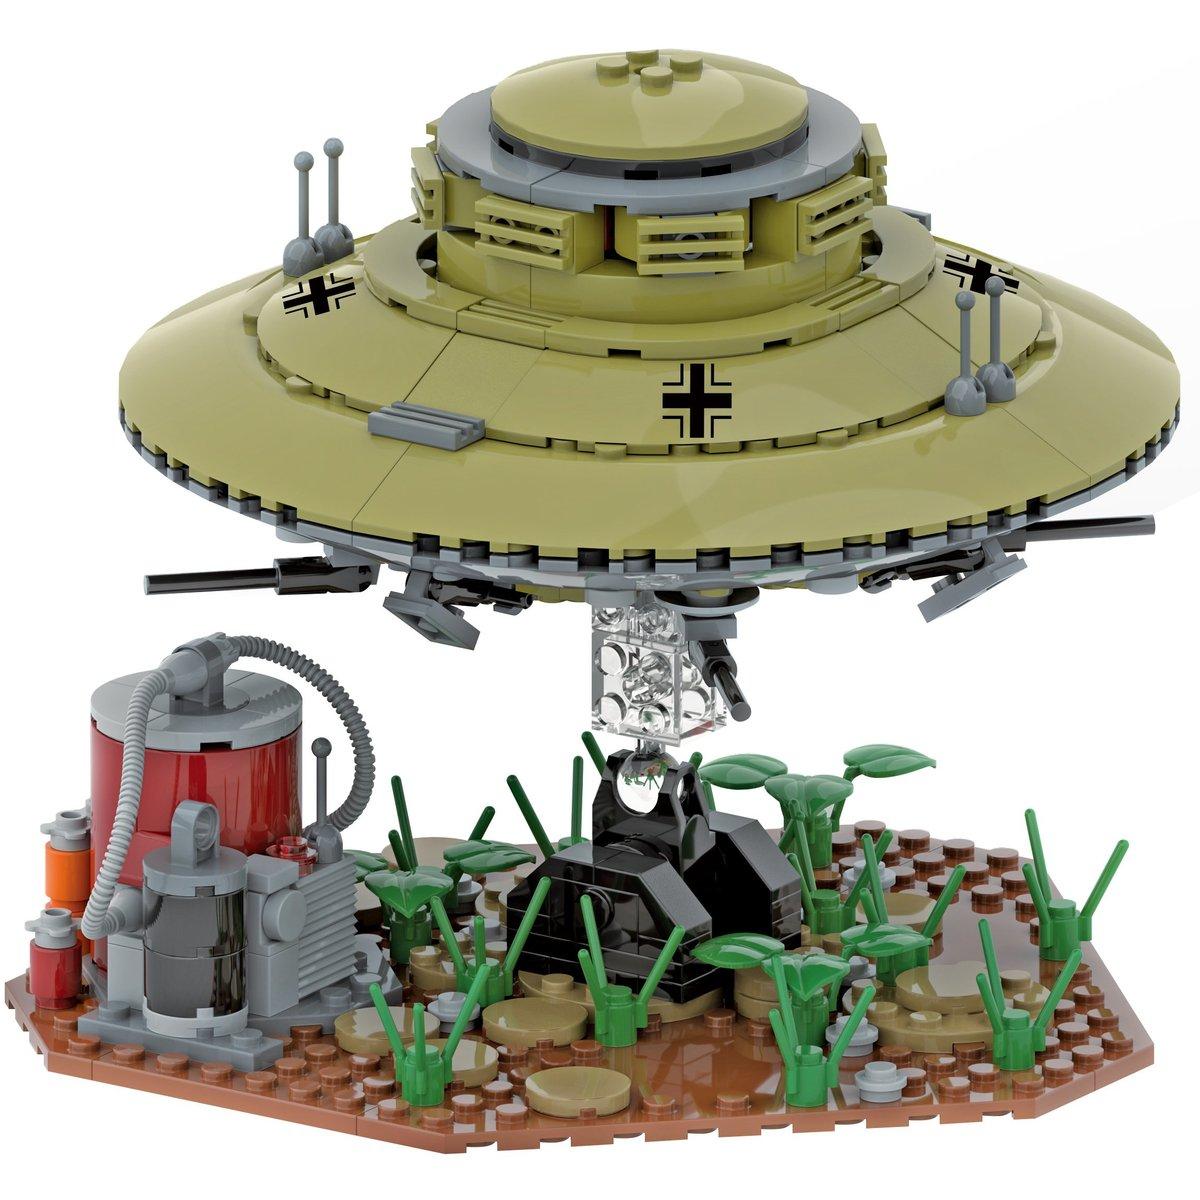 Modbrix UFO Flugscheibe aus Klemmbausteinen